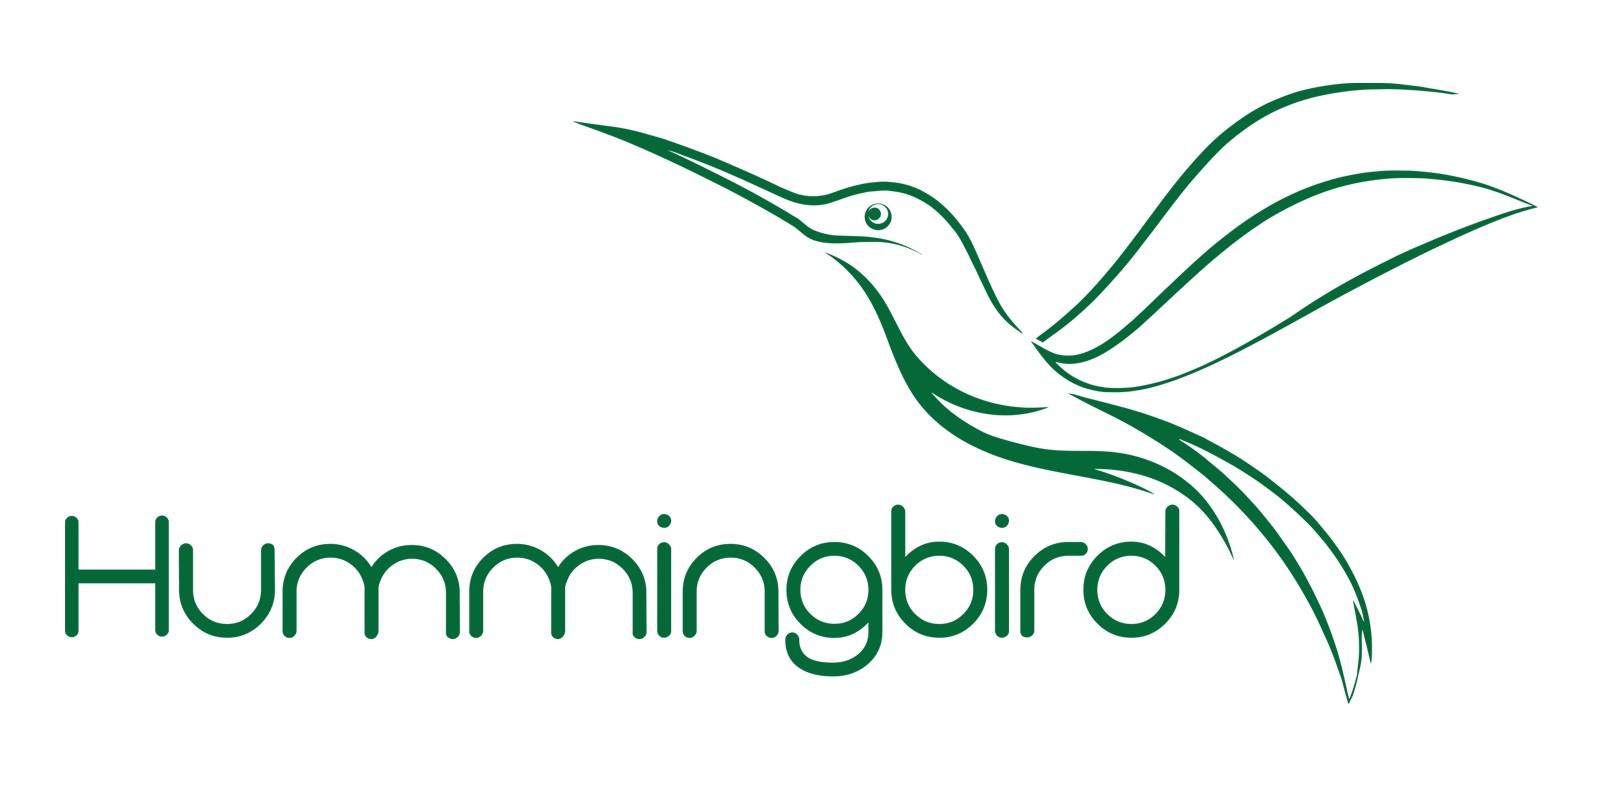 Abstract  Hummingbird Vector Logo